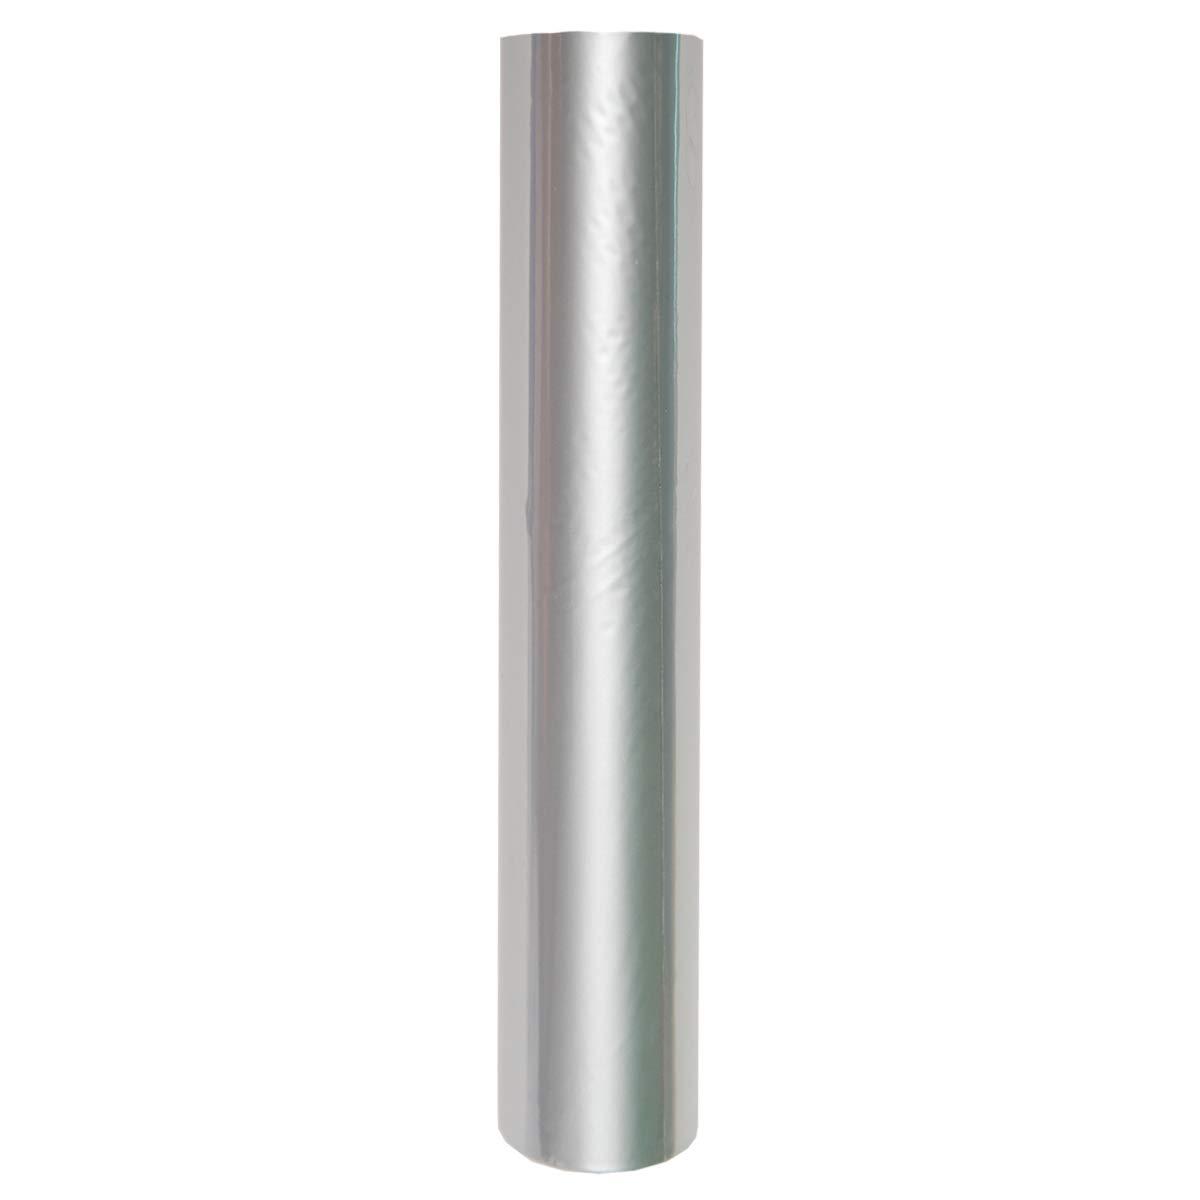 Spellbinders GLF-003 Roll-Silver Glimmer Hot Foil Plate